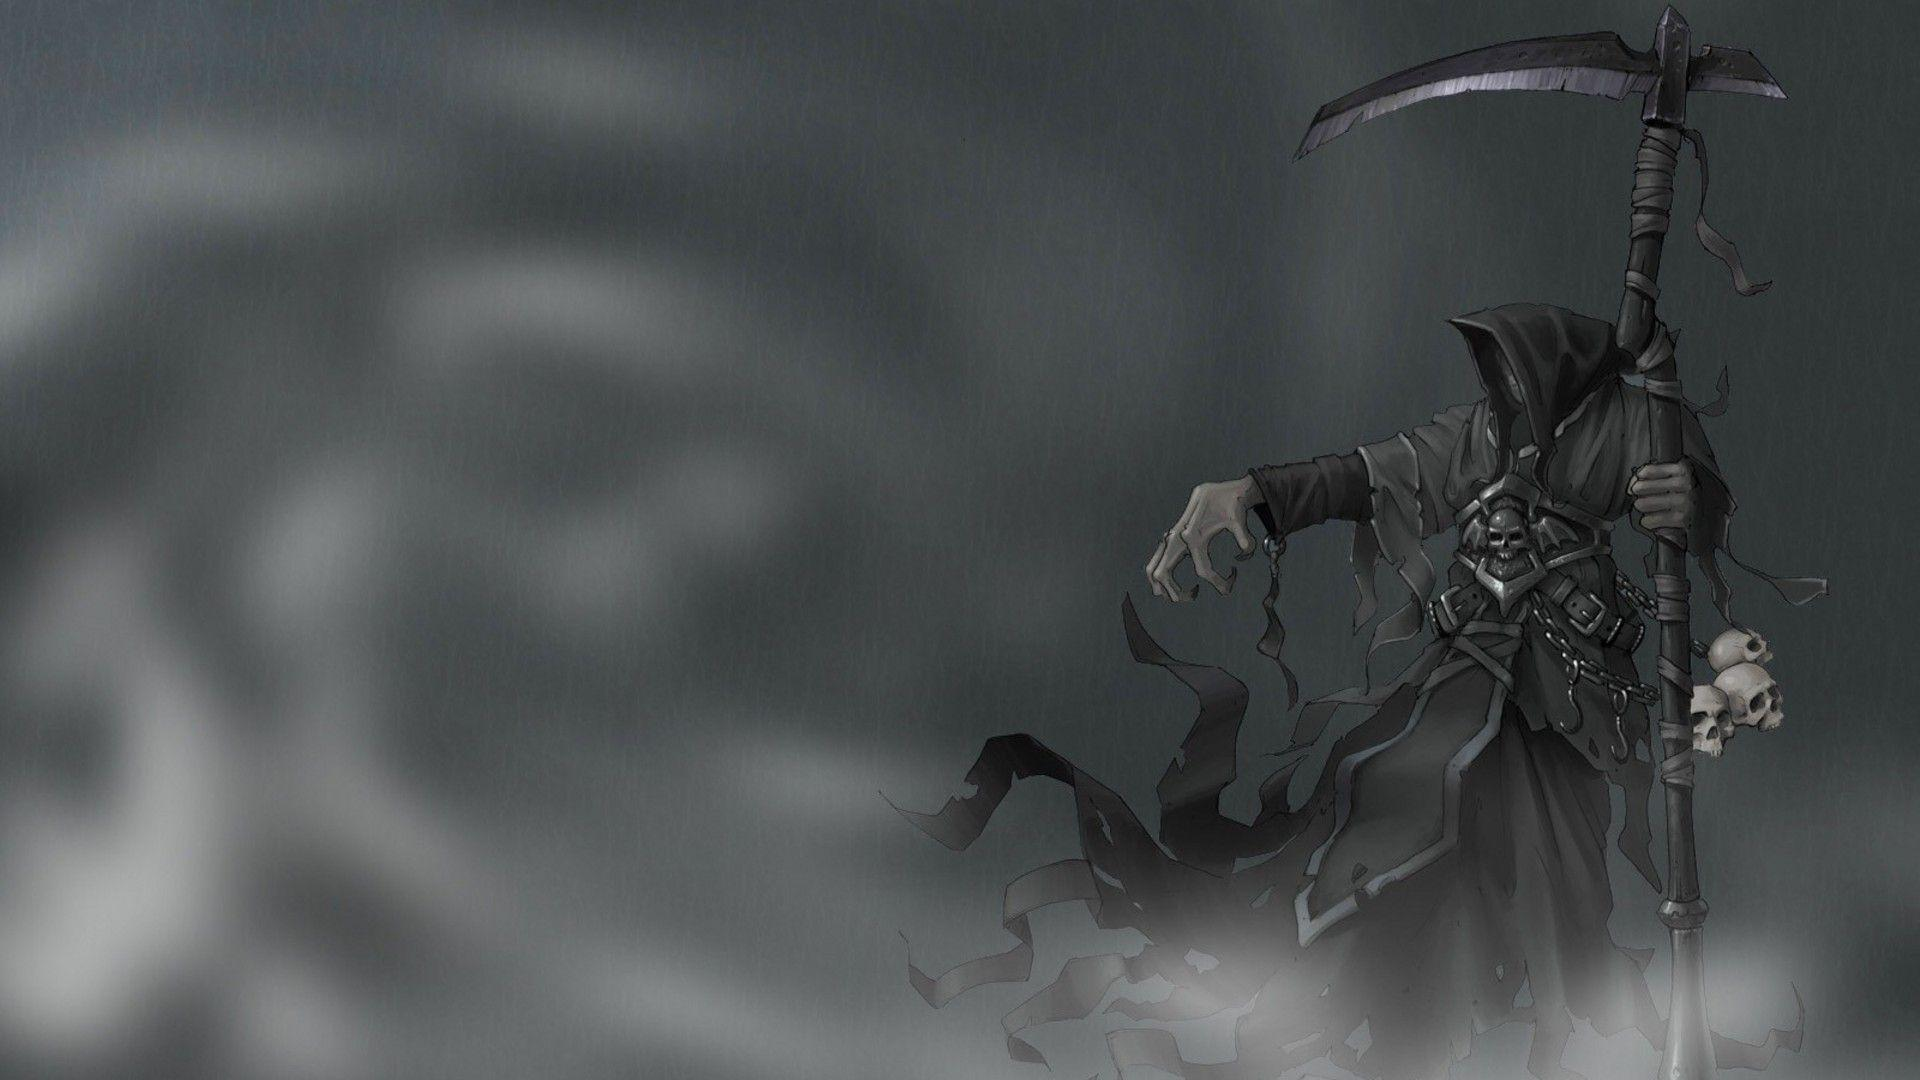 Grim Reaper Backgrounds - Wallpaper Cave